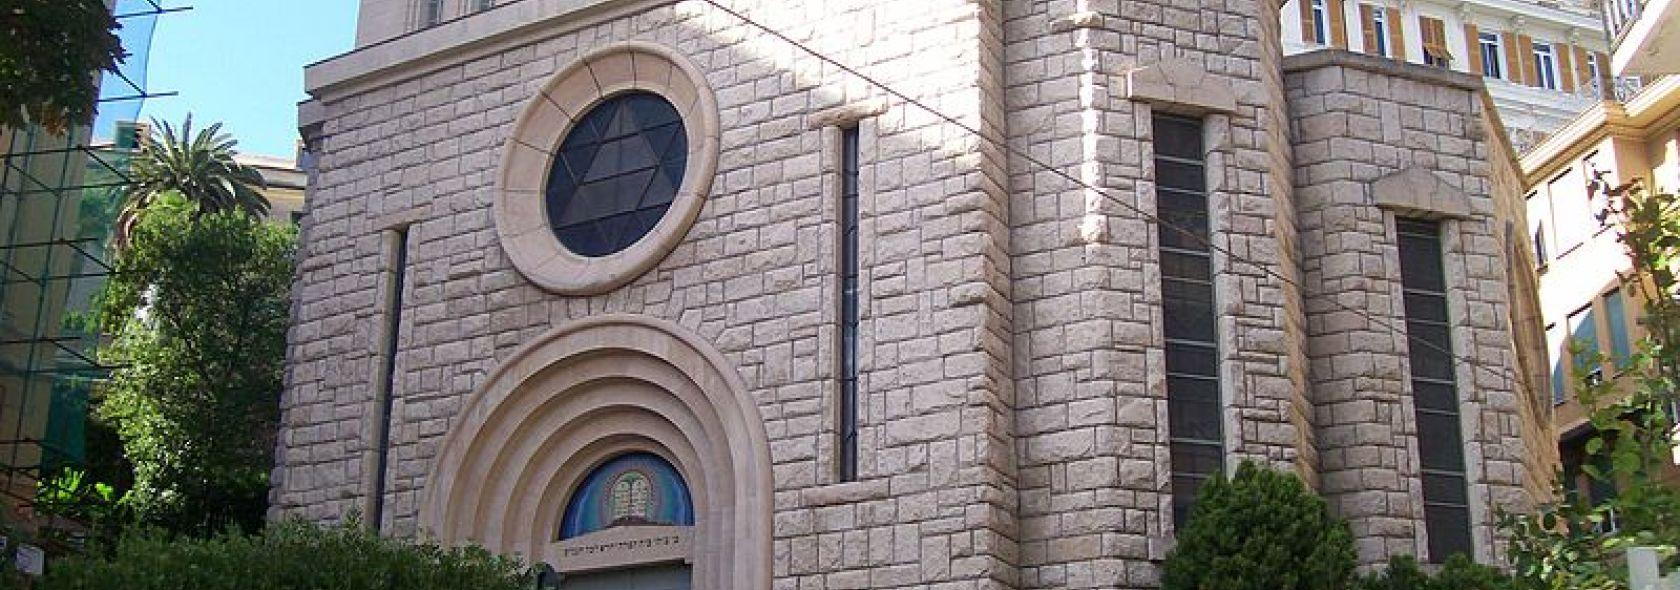 Sinagoga di Genova - foto: © Wikimedia Creative Commons 3.0